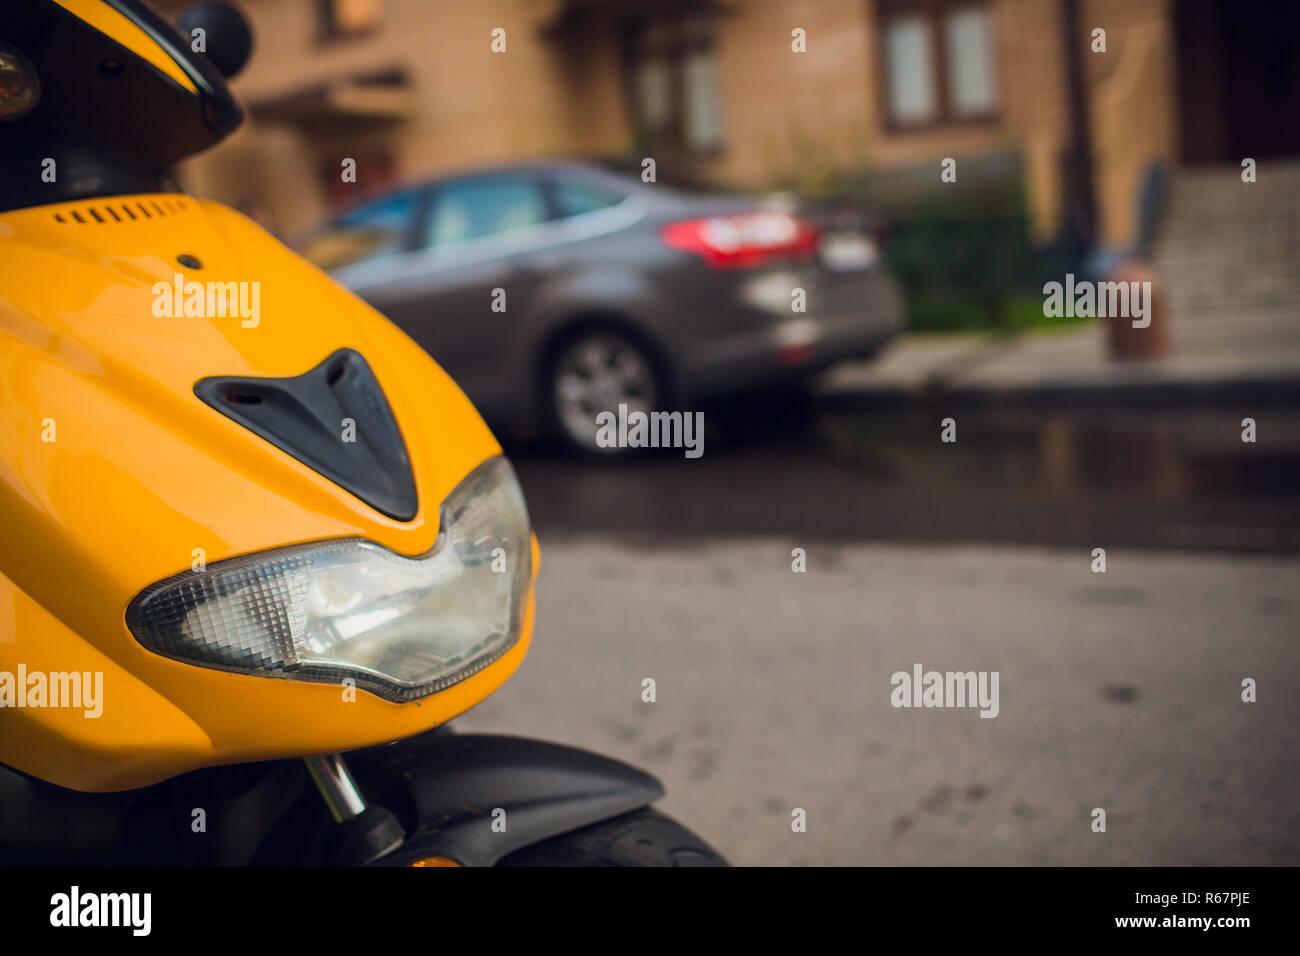 focus on headlamp. Retro motorcycle with headlight - Stock Image